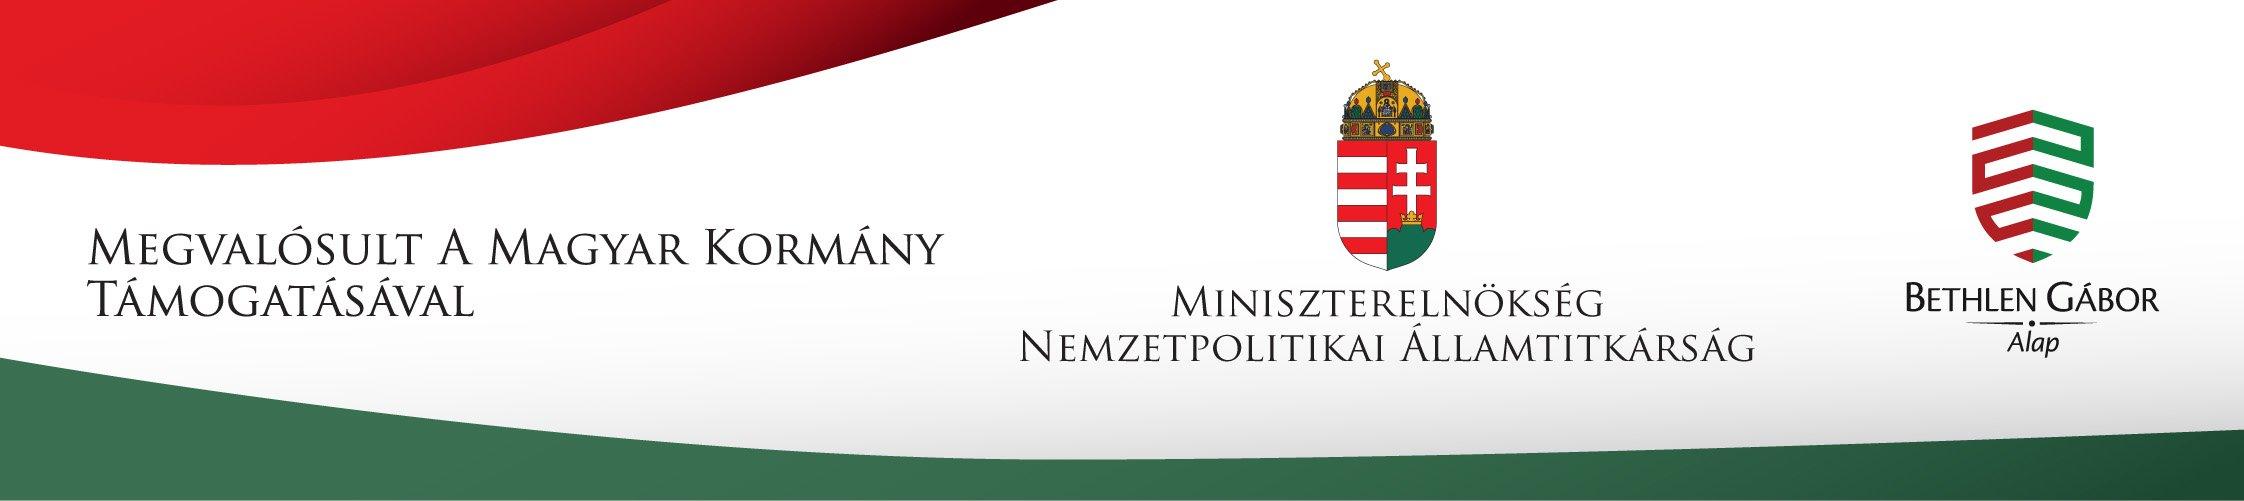 xmegvalosult_a_magyar_kormany_tamogatasaval_bga_alap.jpg.pagespeed.ic.vZH8rt7JZH